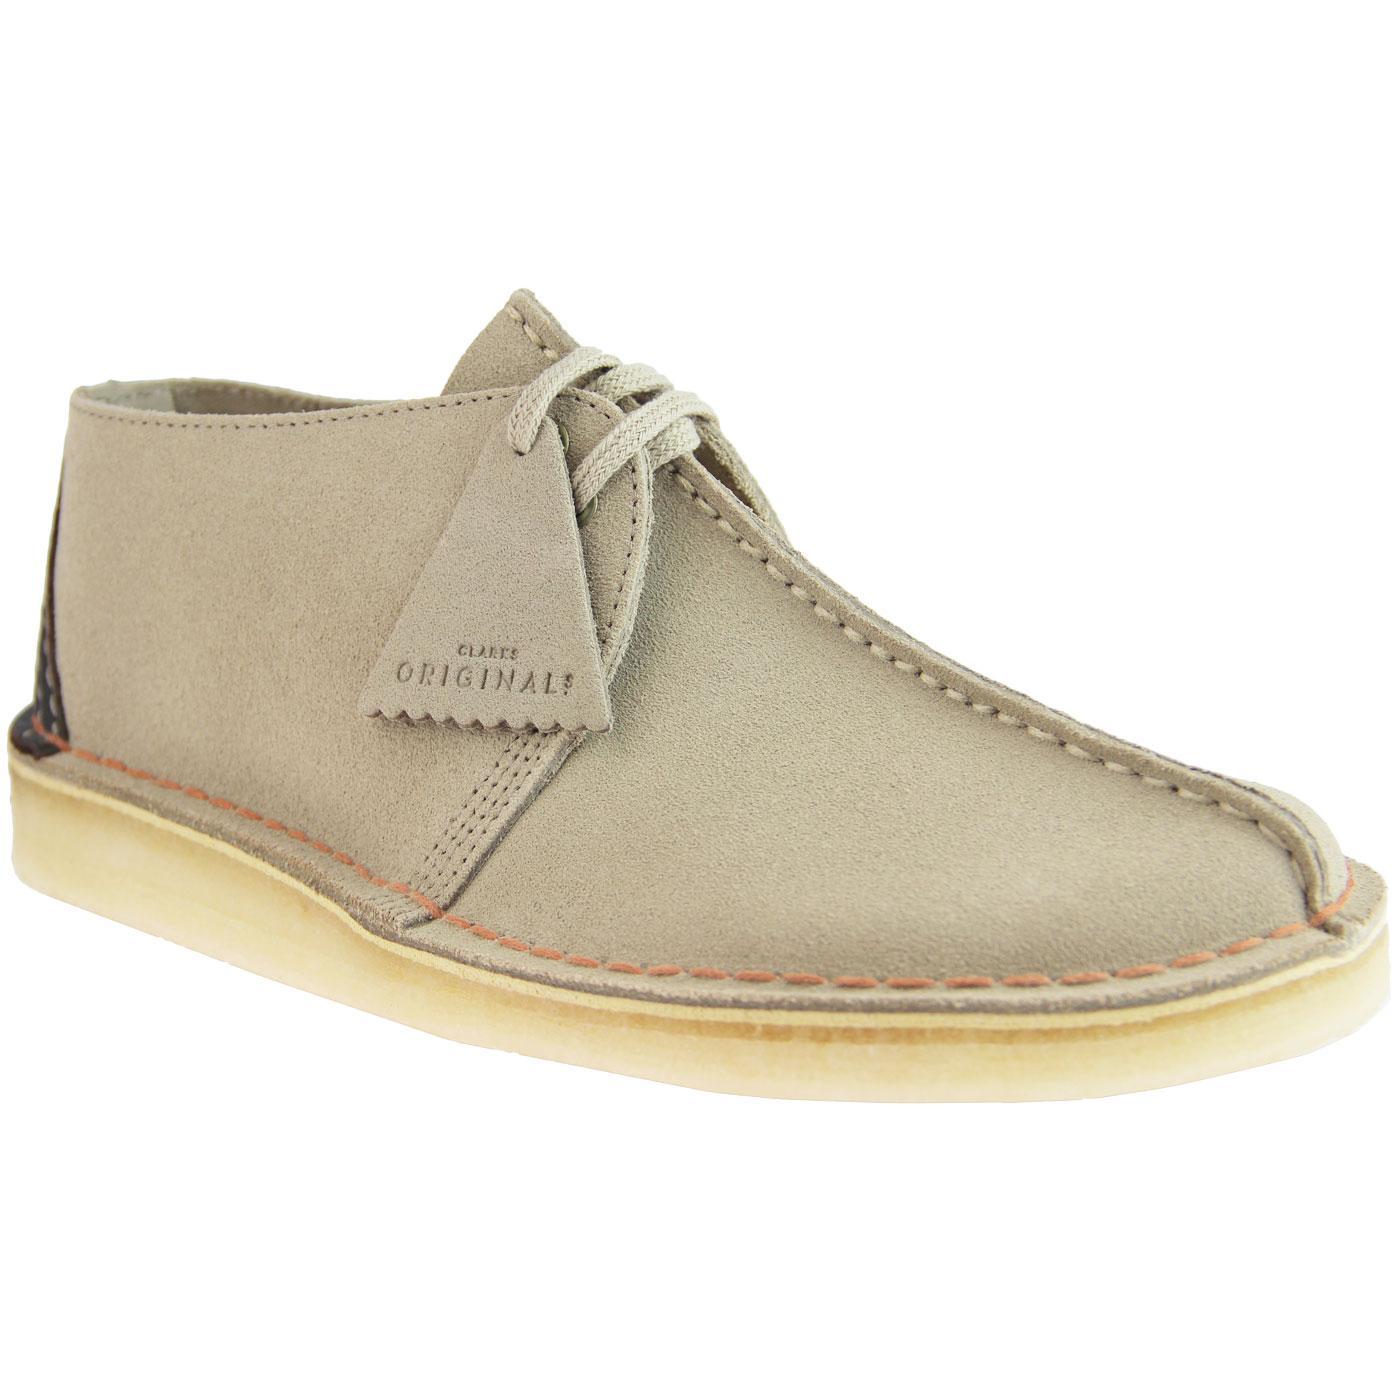 Desert Trek CLARKS ORIGINALS Mens Mod 70s Shoes S